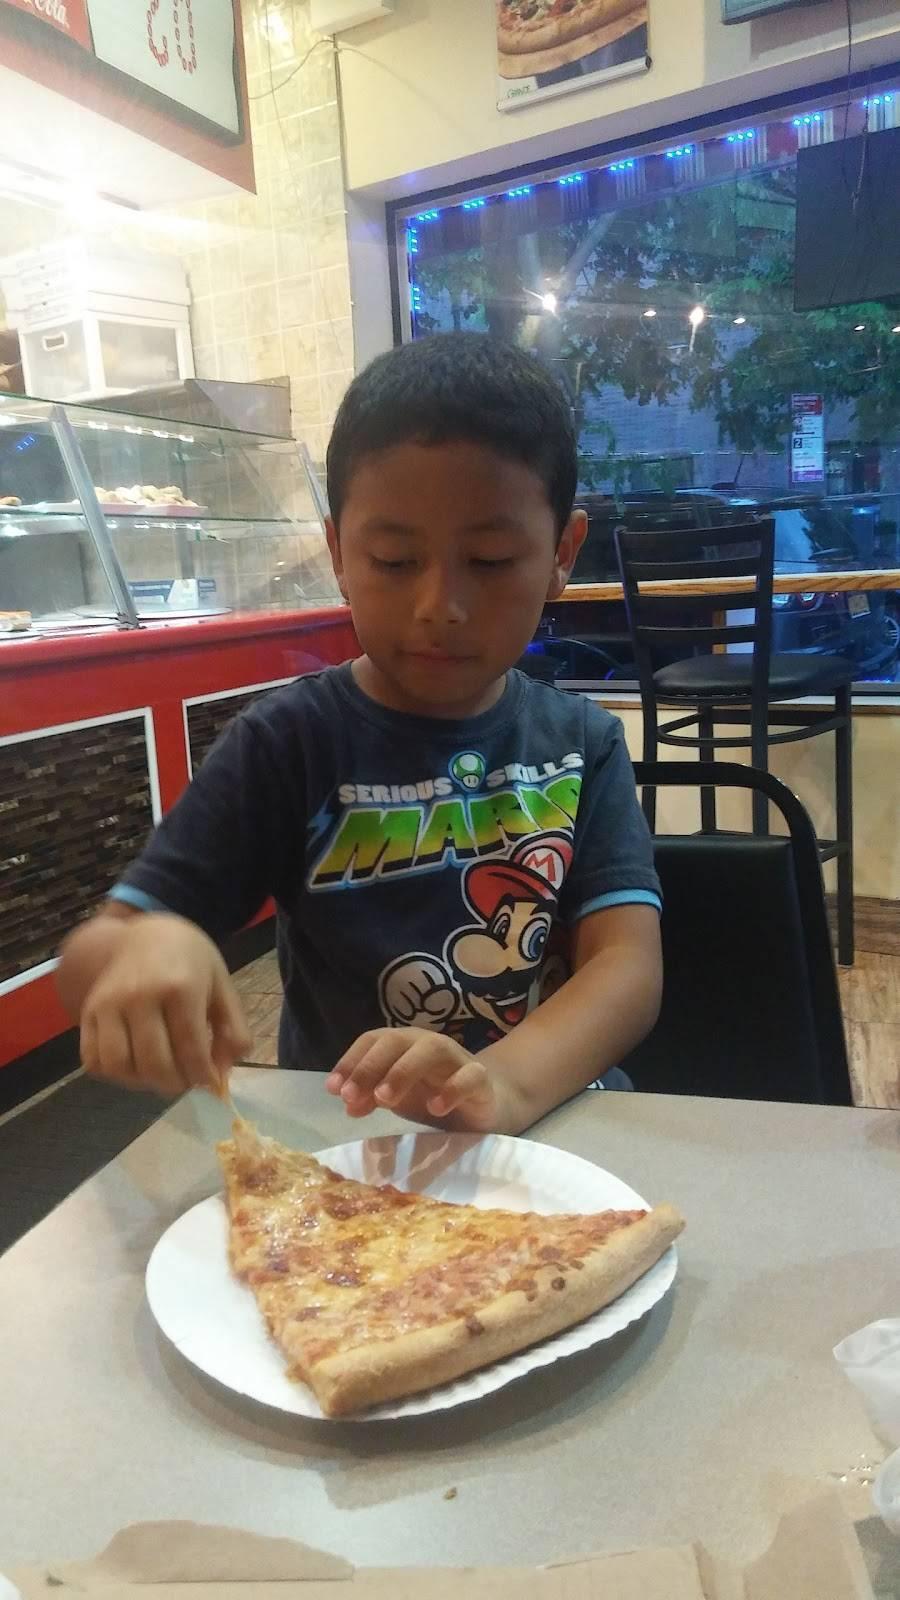 Pronto Pizza   restaurant   89-30 Queens Blvd, Elmhurst, NY 11373, USA   7184241500 OR +1 718-424-1500